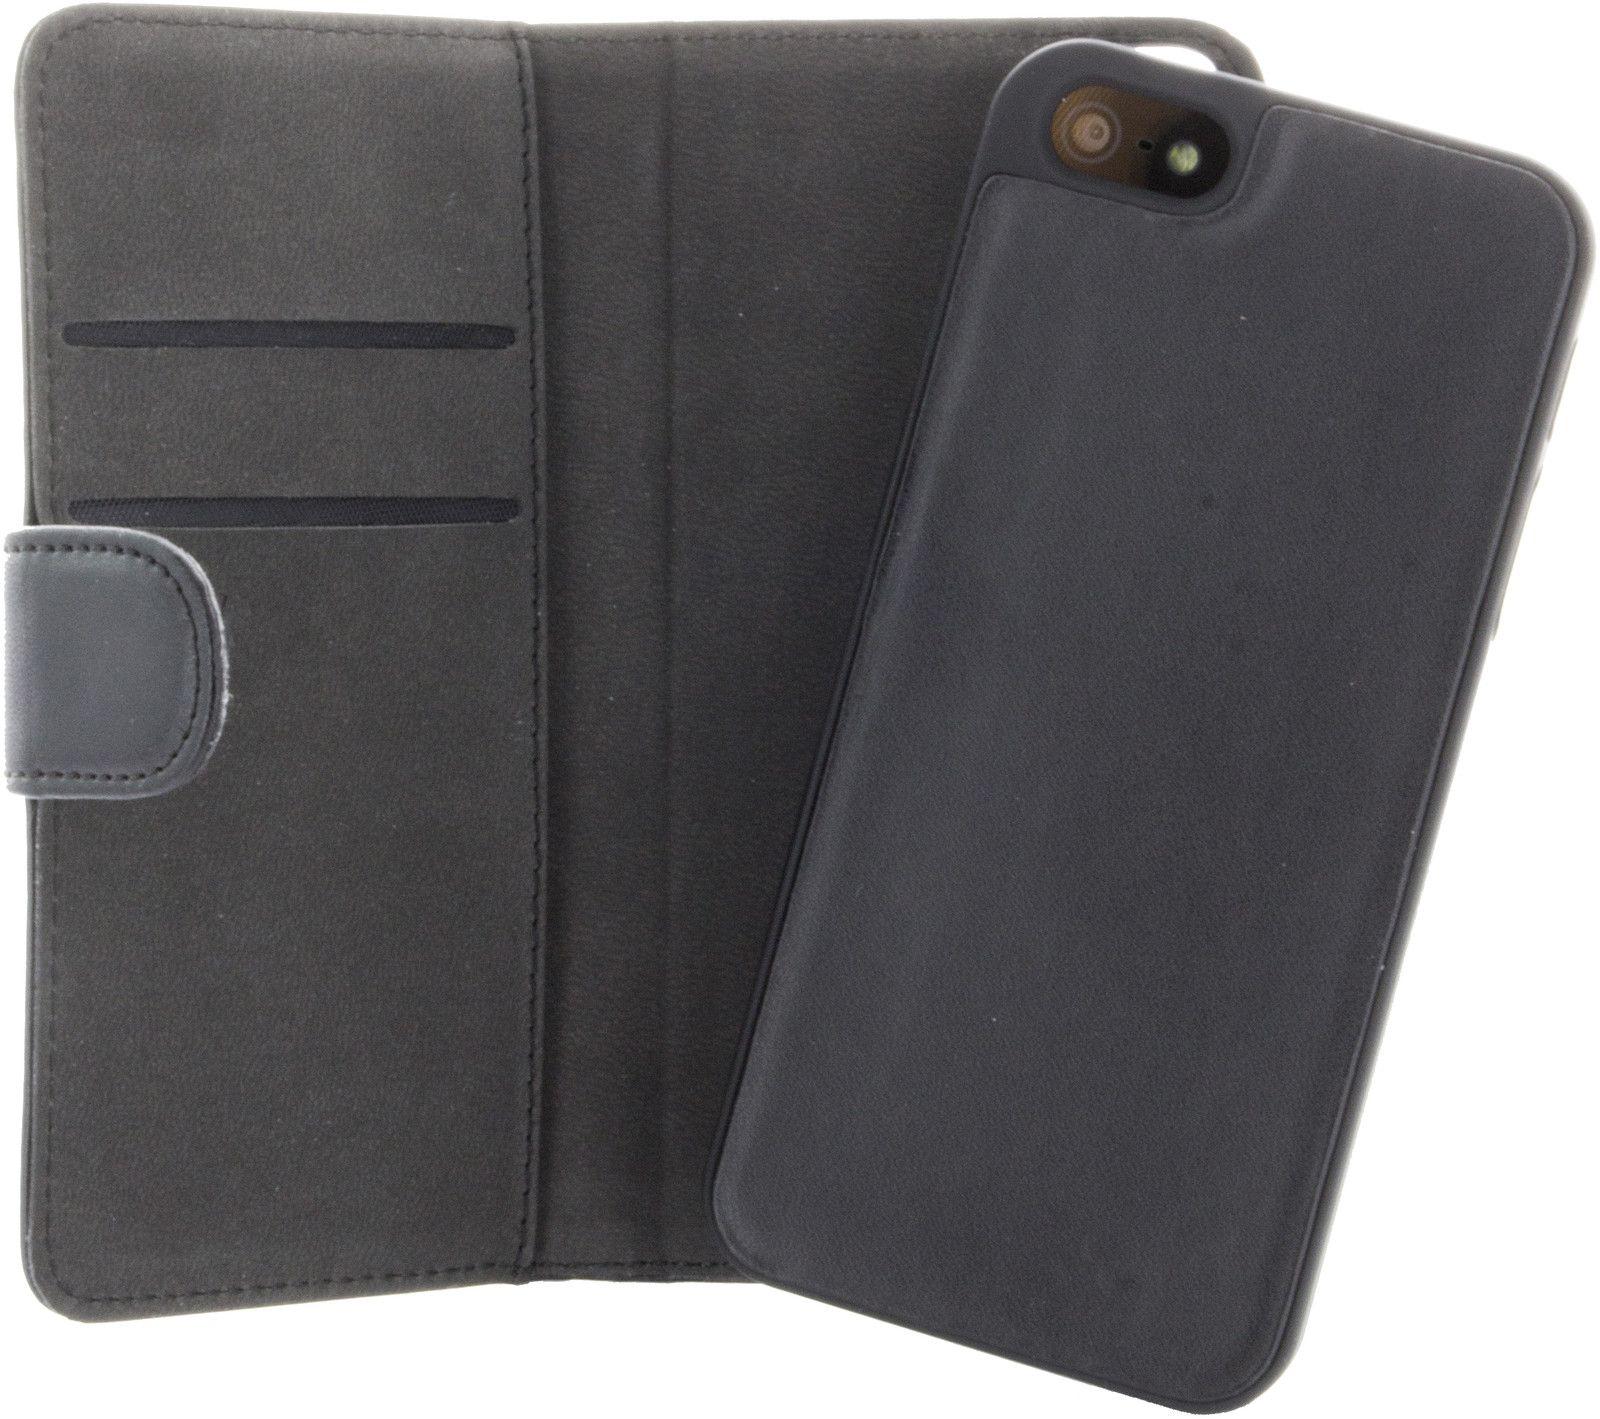 Gear Plånboksväska med magnetskal (iPhone 5/5S/SE)